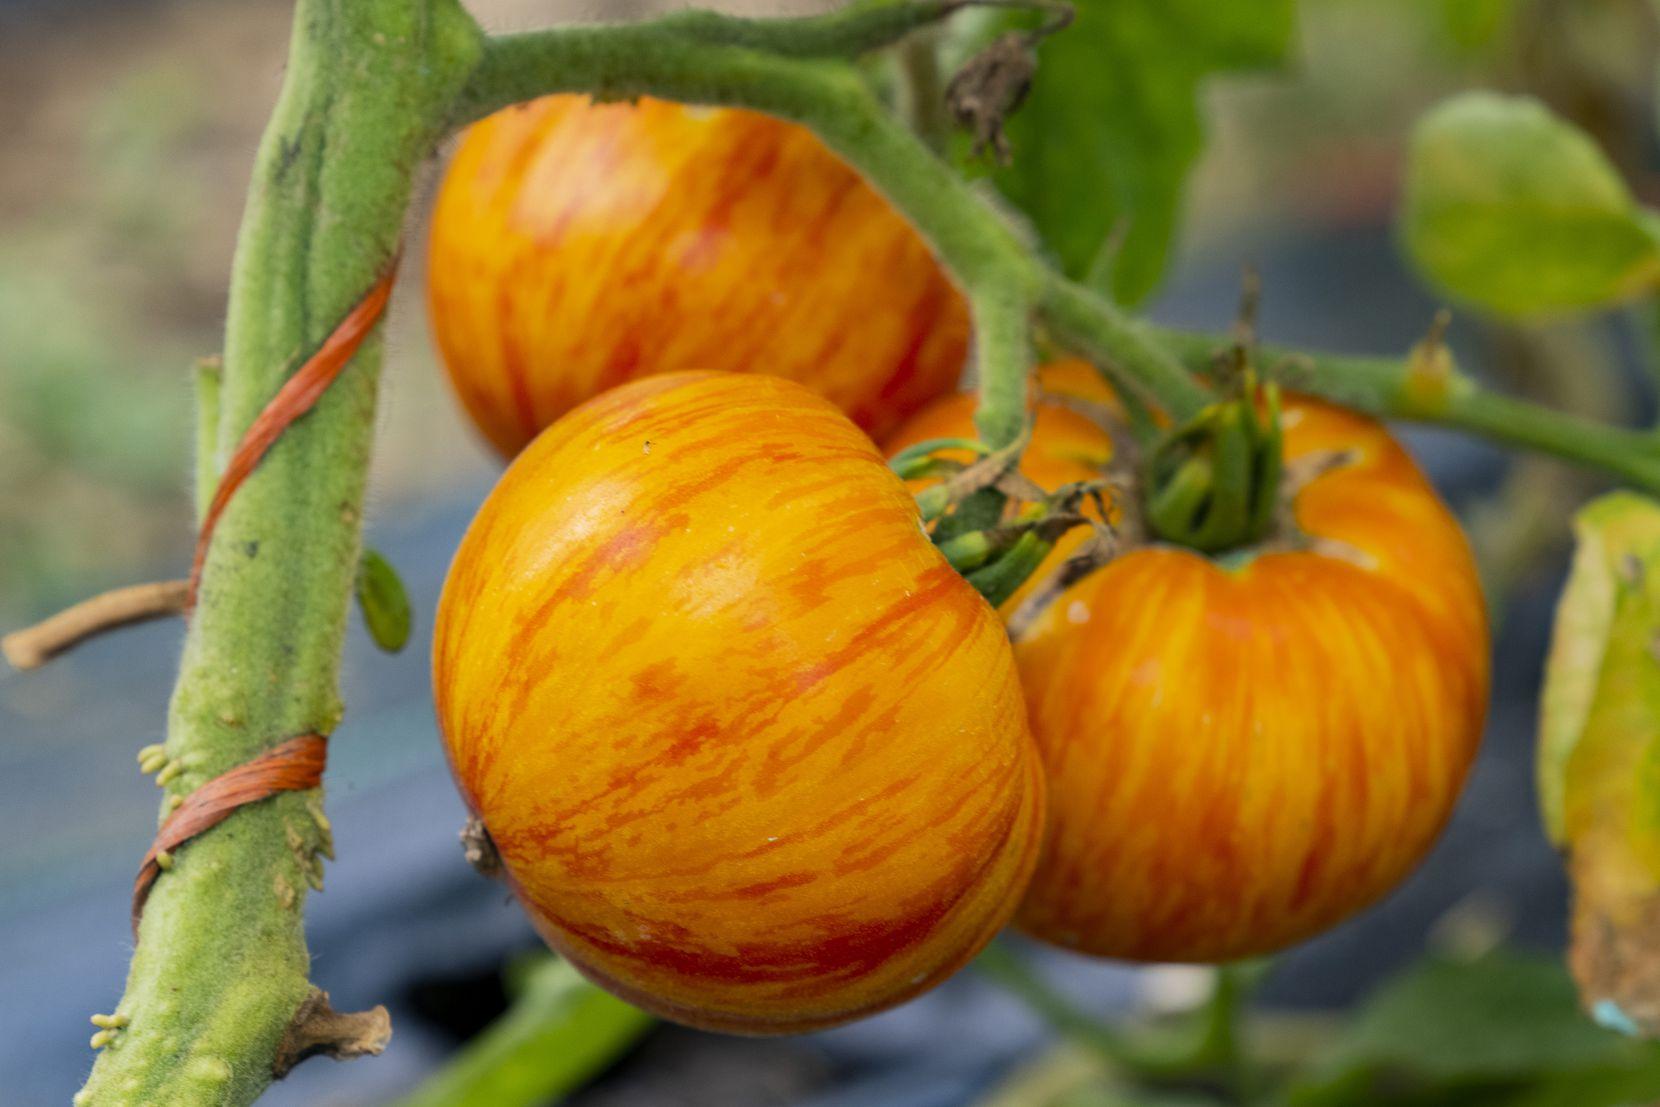 A solar flare heirloom tomato grows on the vine at Misty Moon Farms.